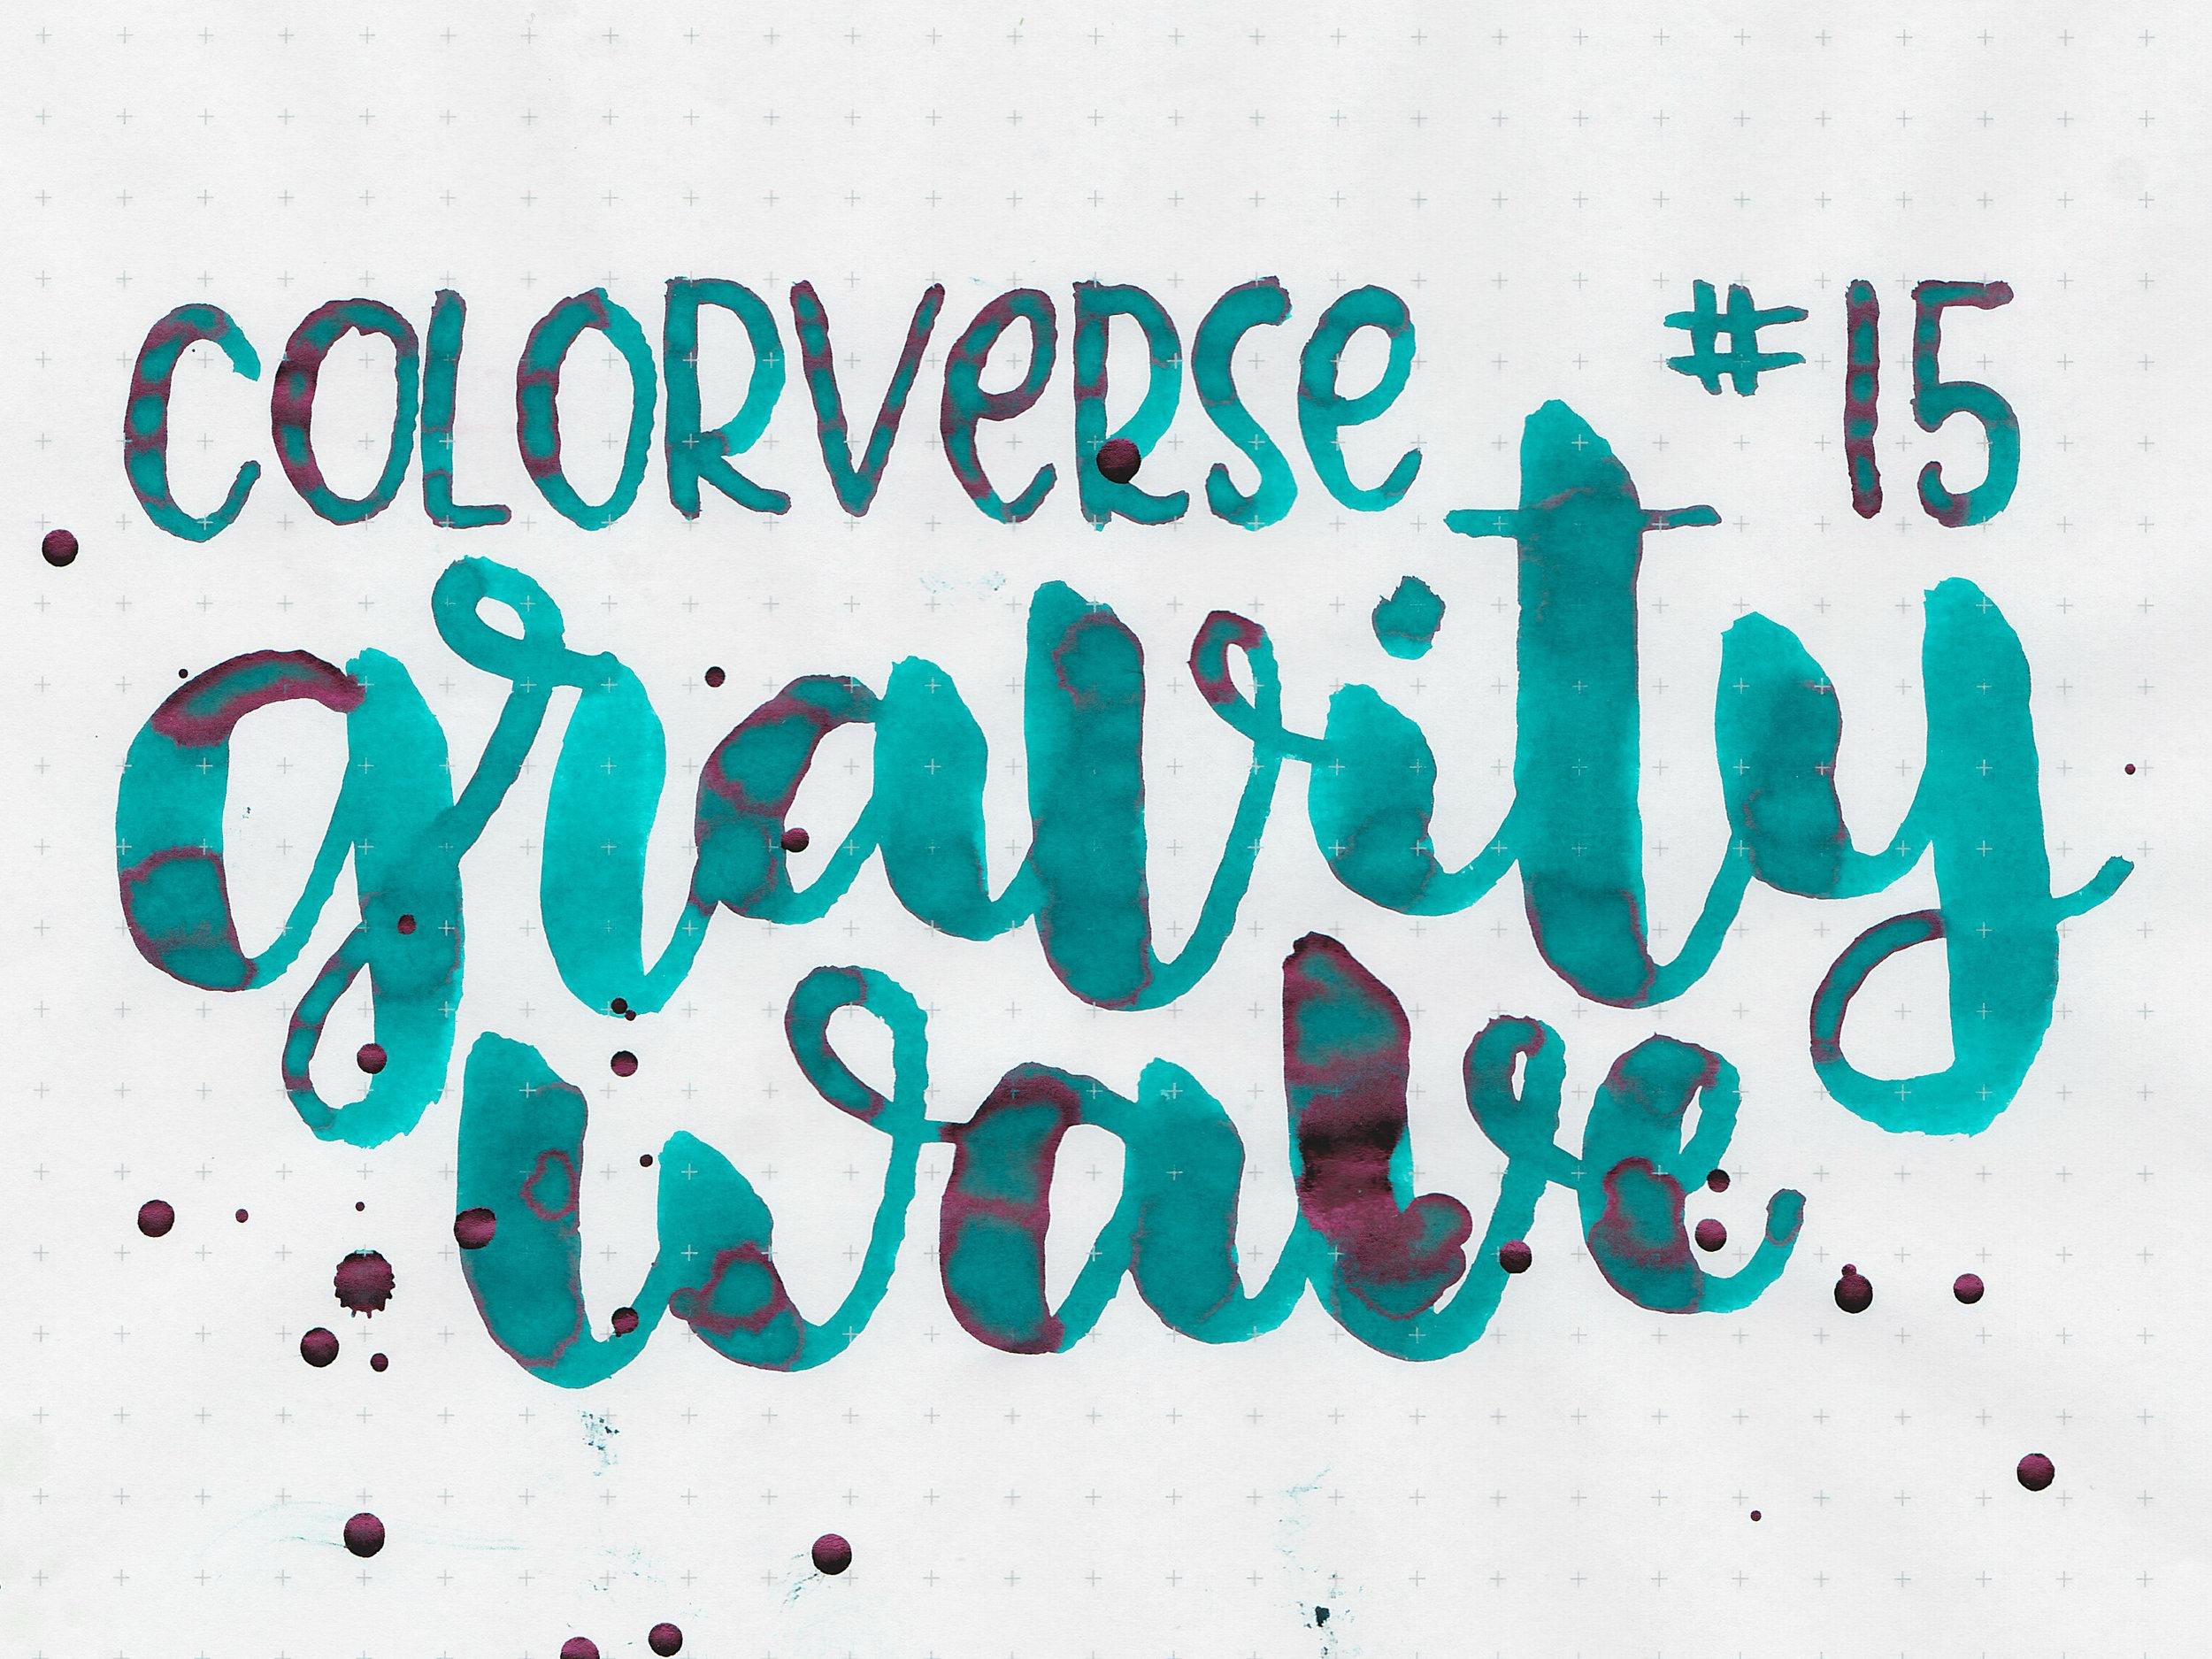 cv-gravity-wave-2.jpg